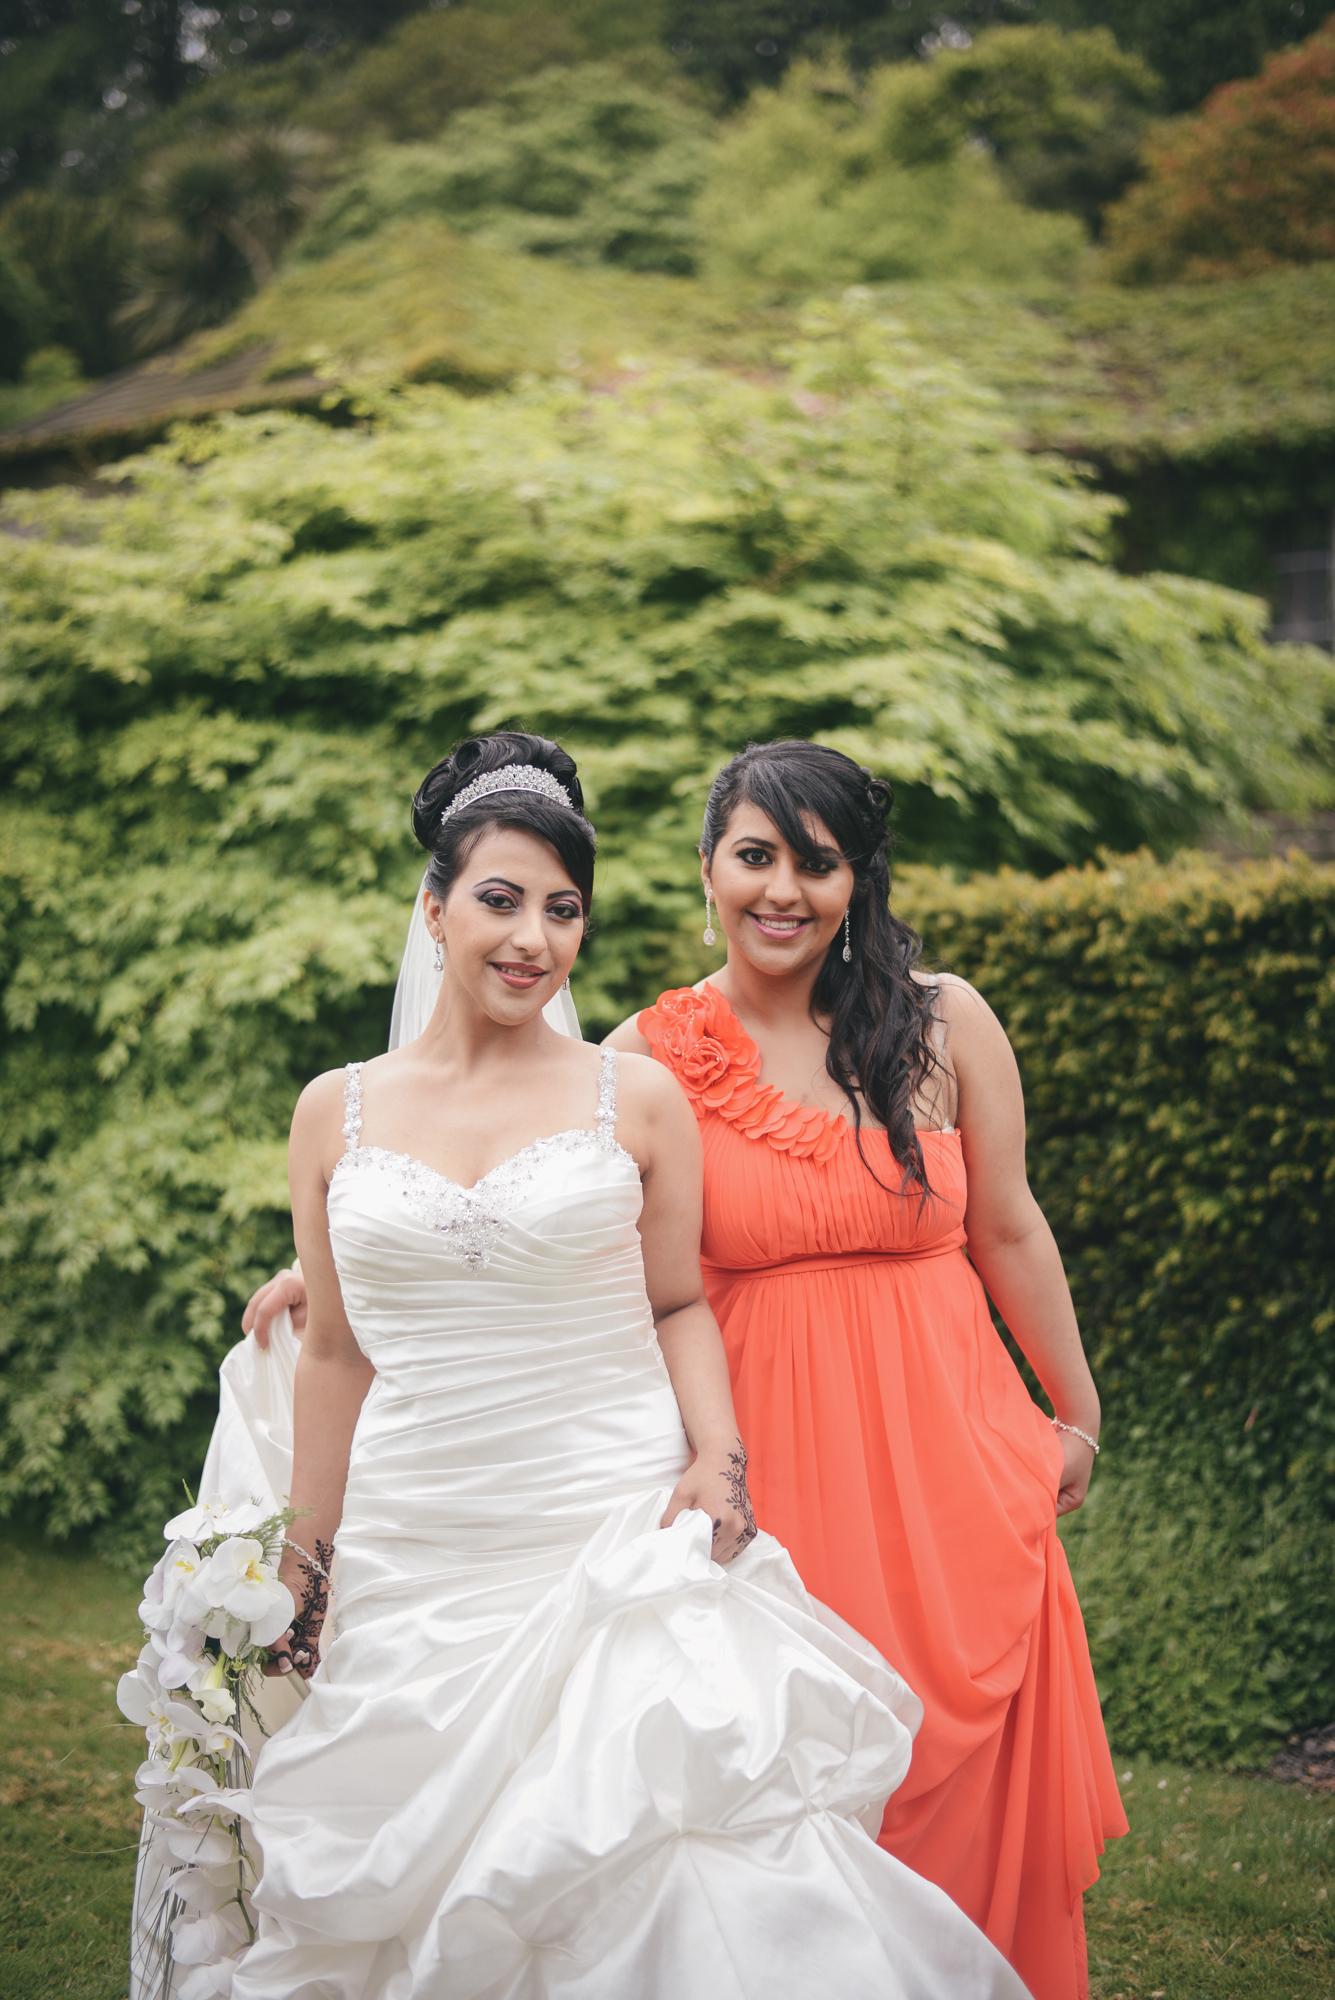 Gergis+Rania-blog-52.jpg